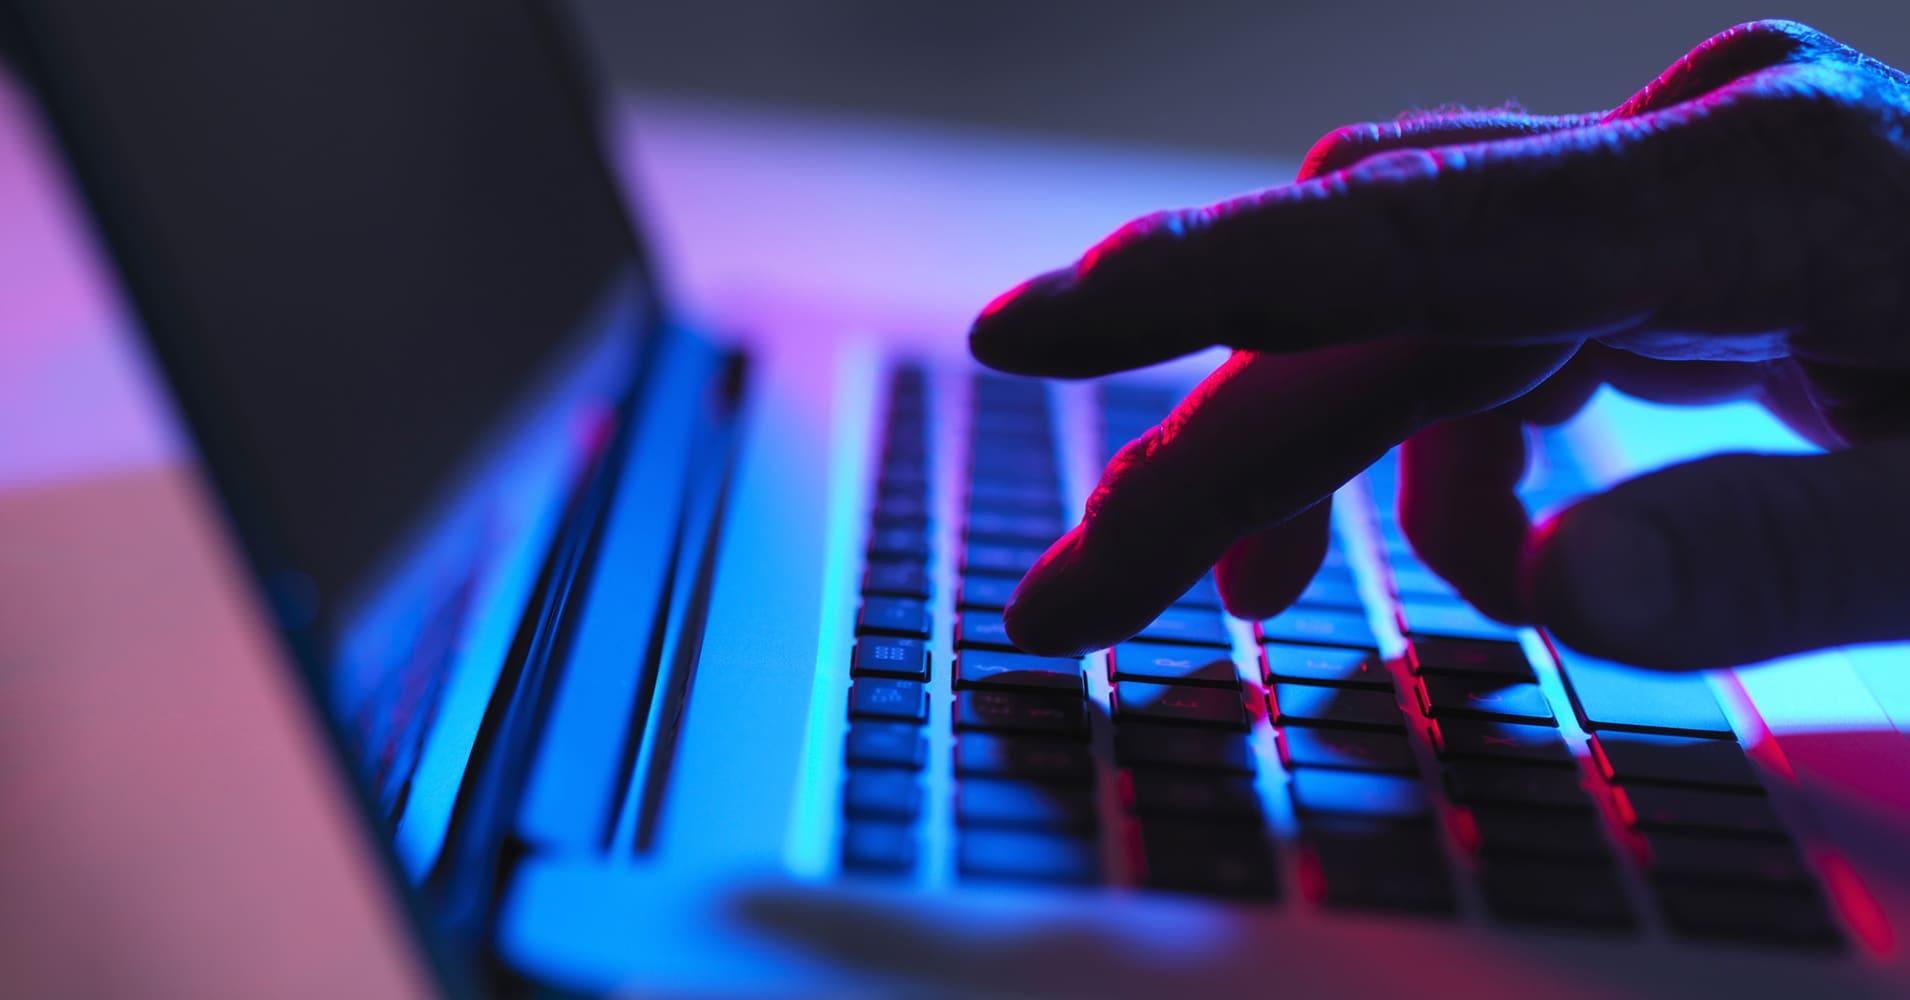 Biometrics: The future of digital security